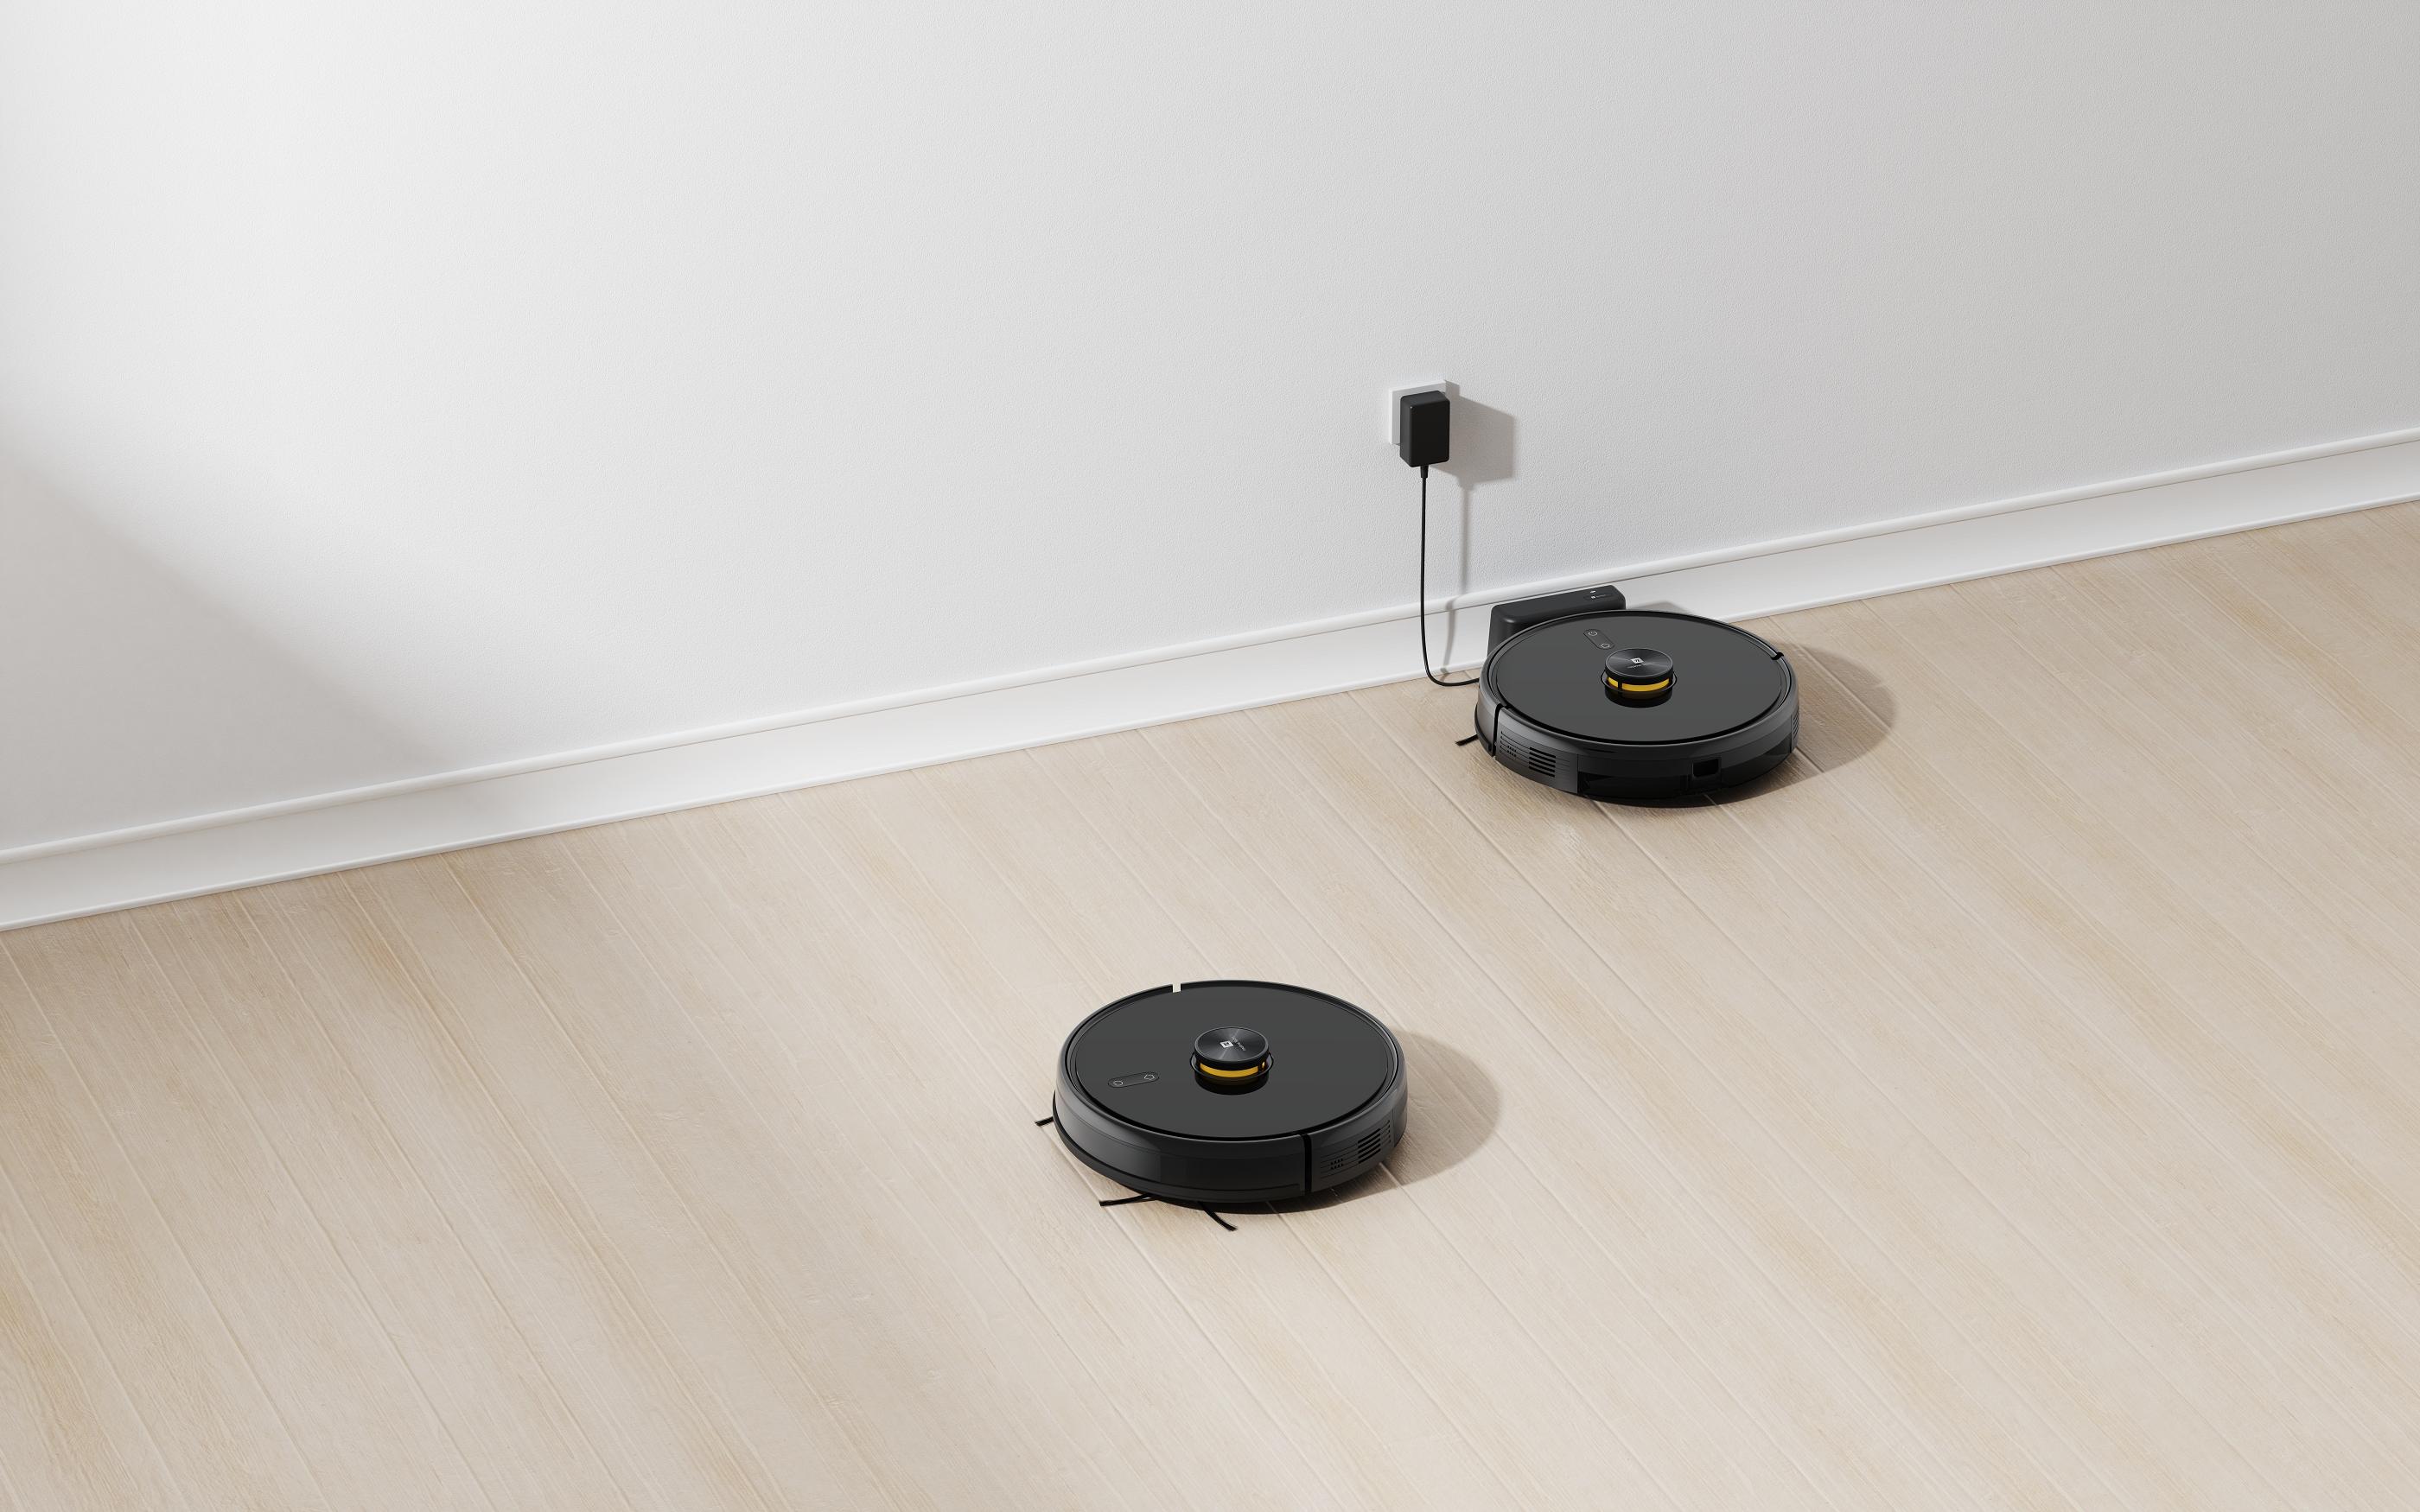 realme TechLife Vacuum